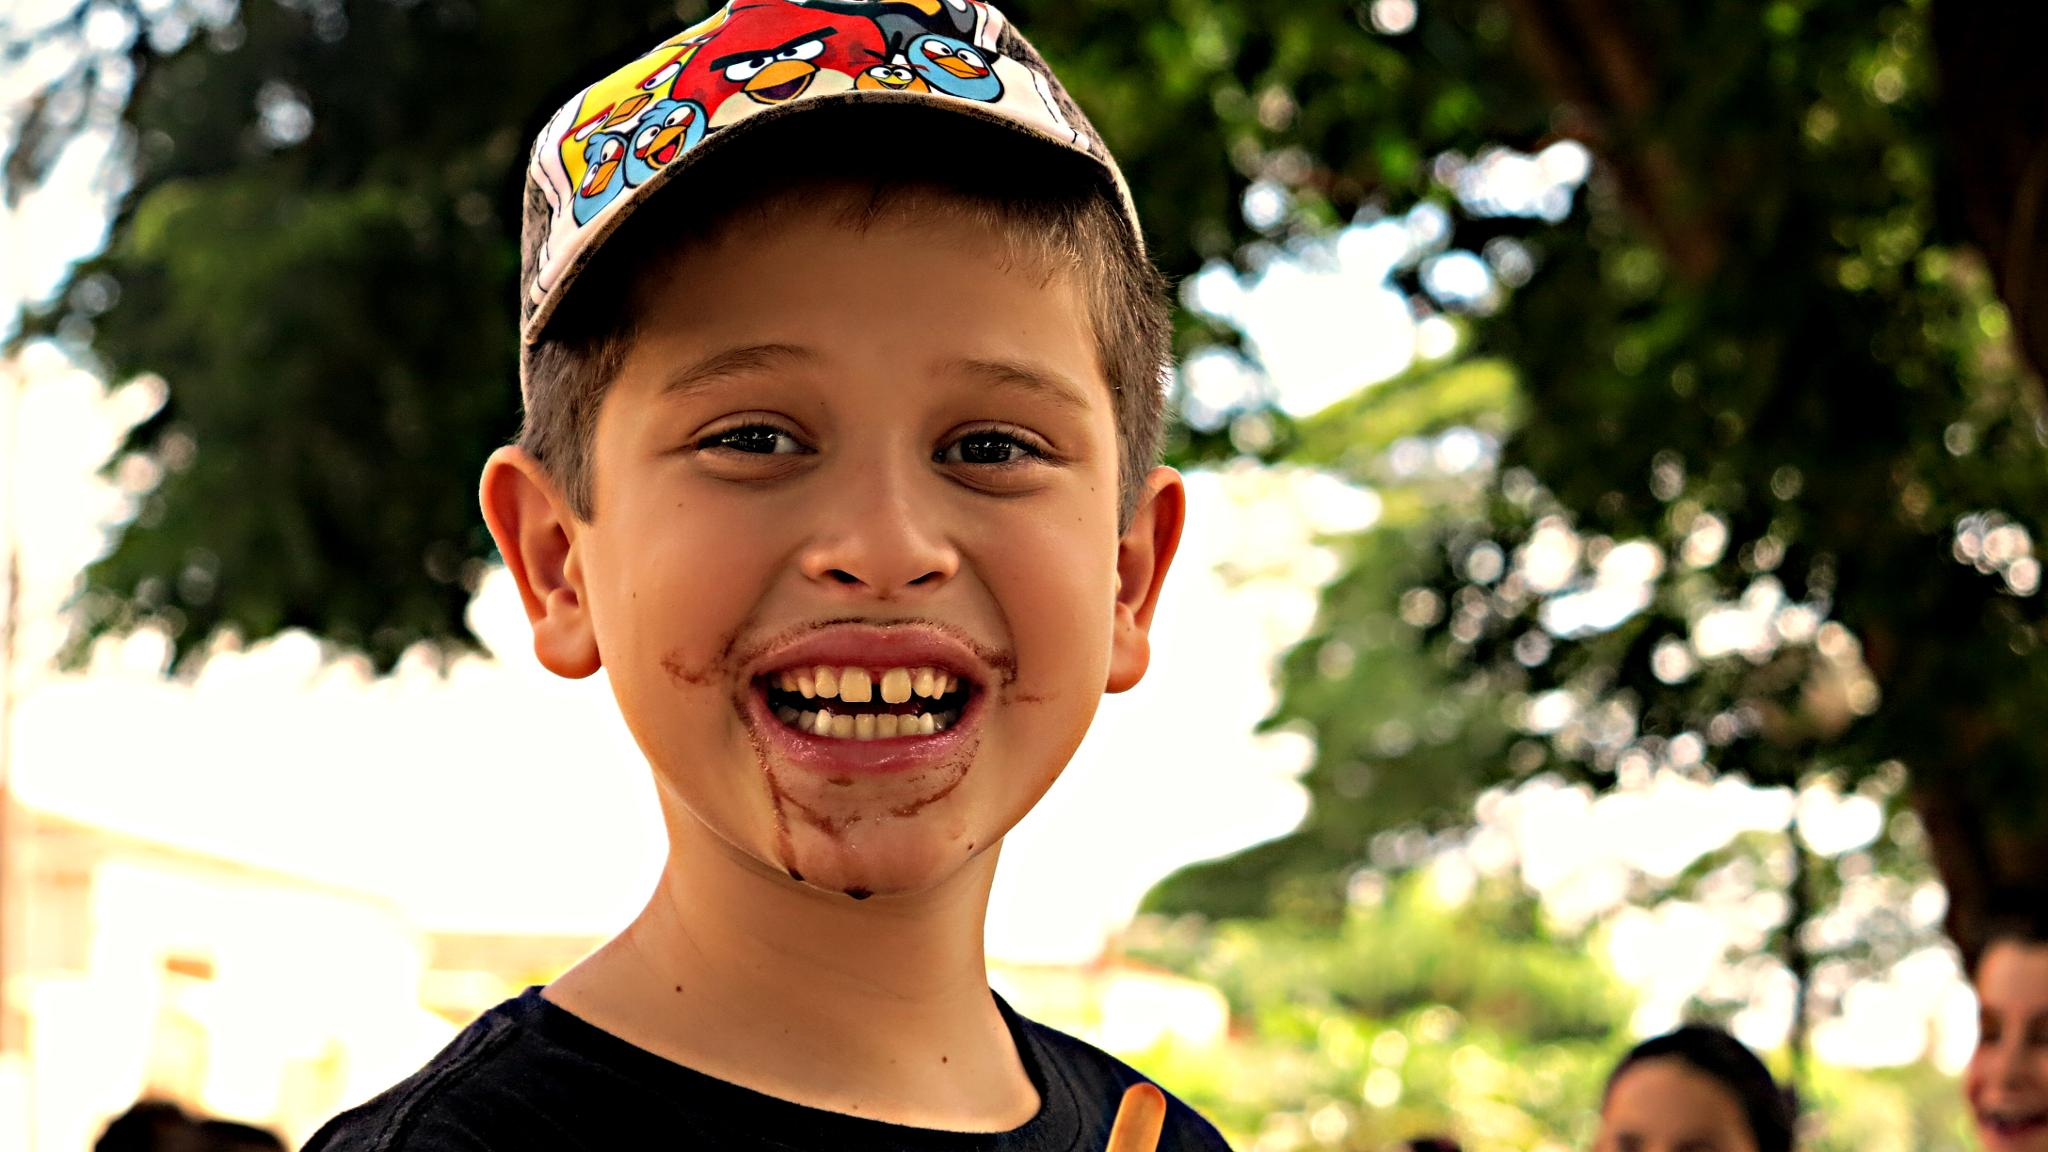 Bigodão de sorvete, hhehehehehehe by denizelucinda